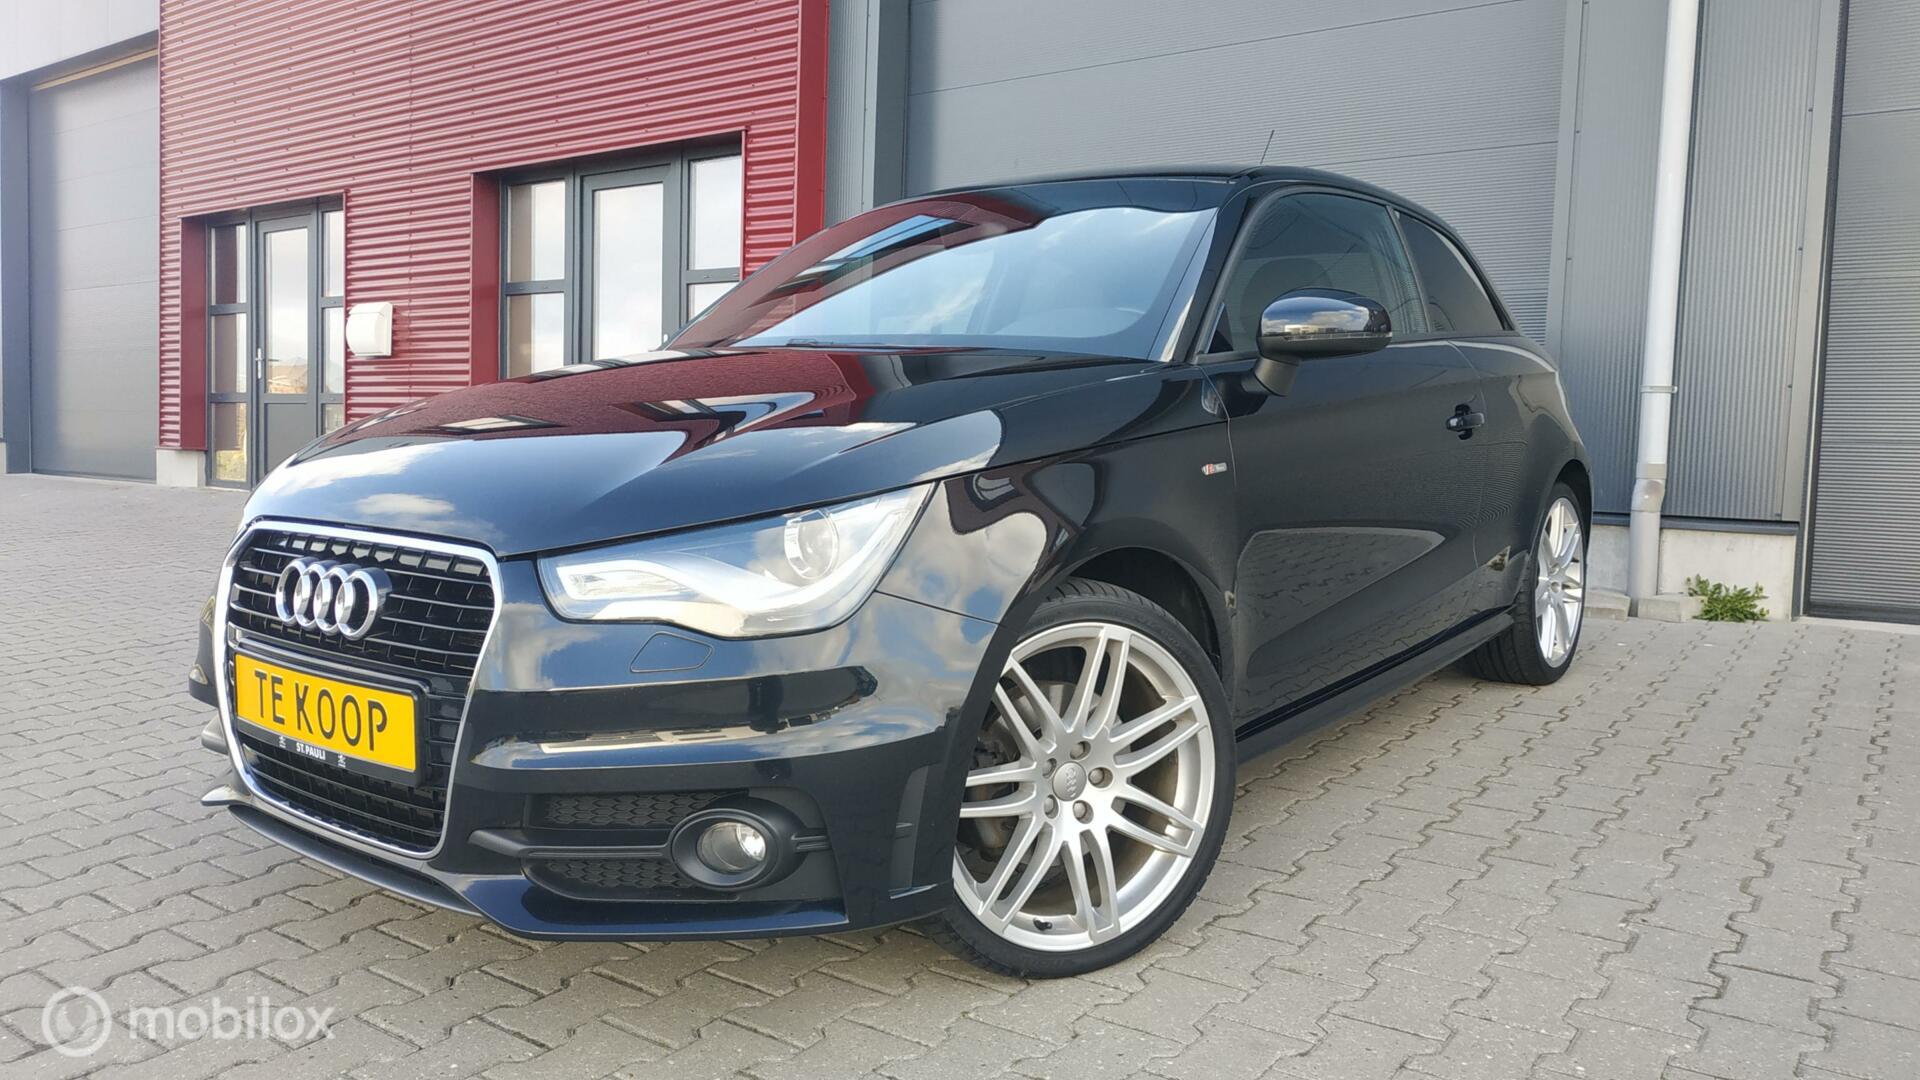 Audi A1 1.4 TFSI / S-edition / S-Line / 185PK / S-tronic